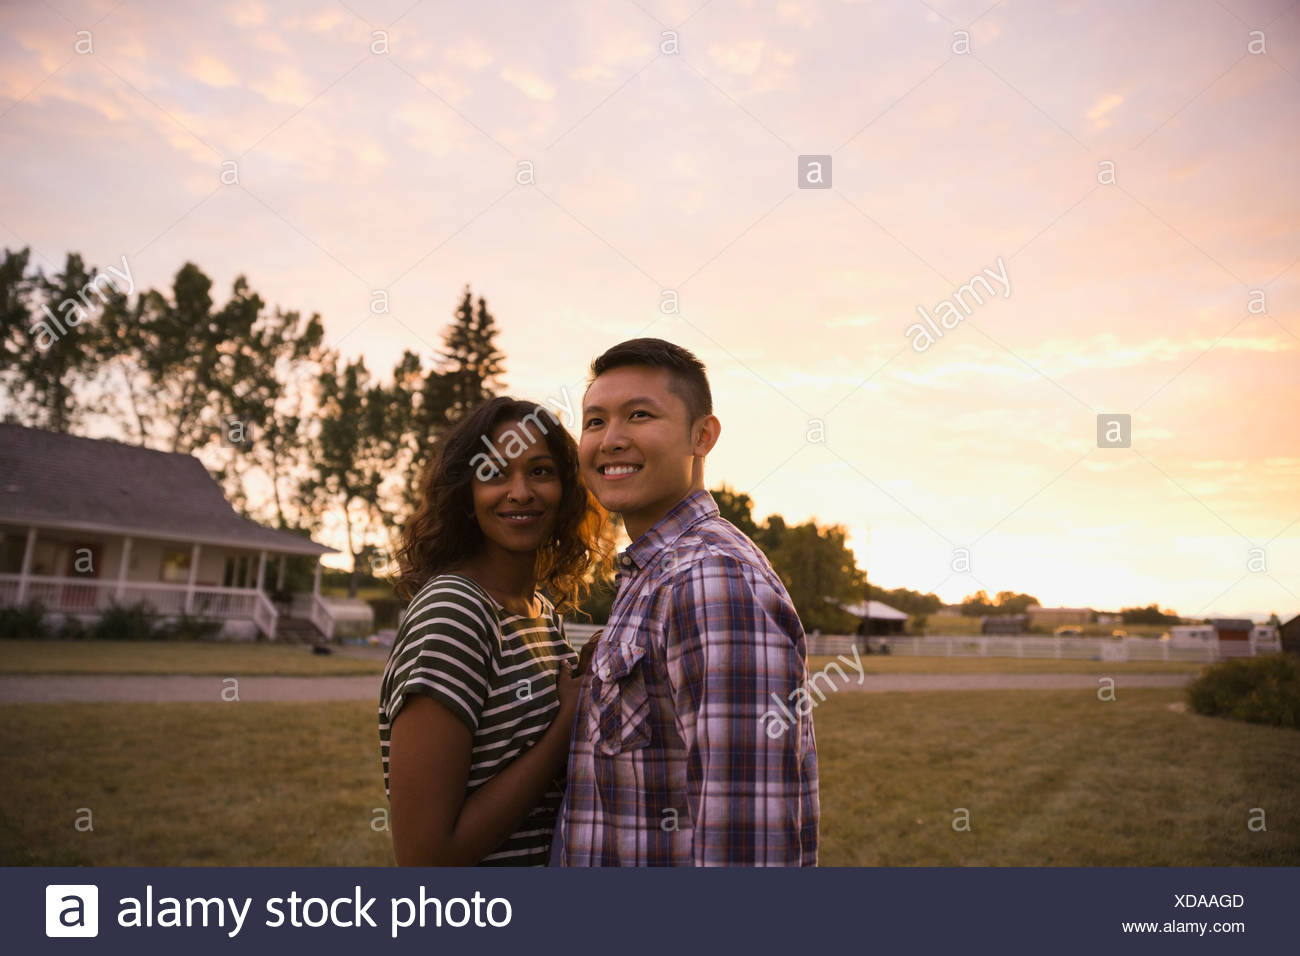 Portrait of multi-ethnic couple standing outdoors - Stock Image